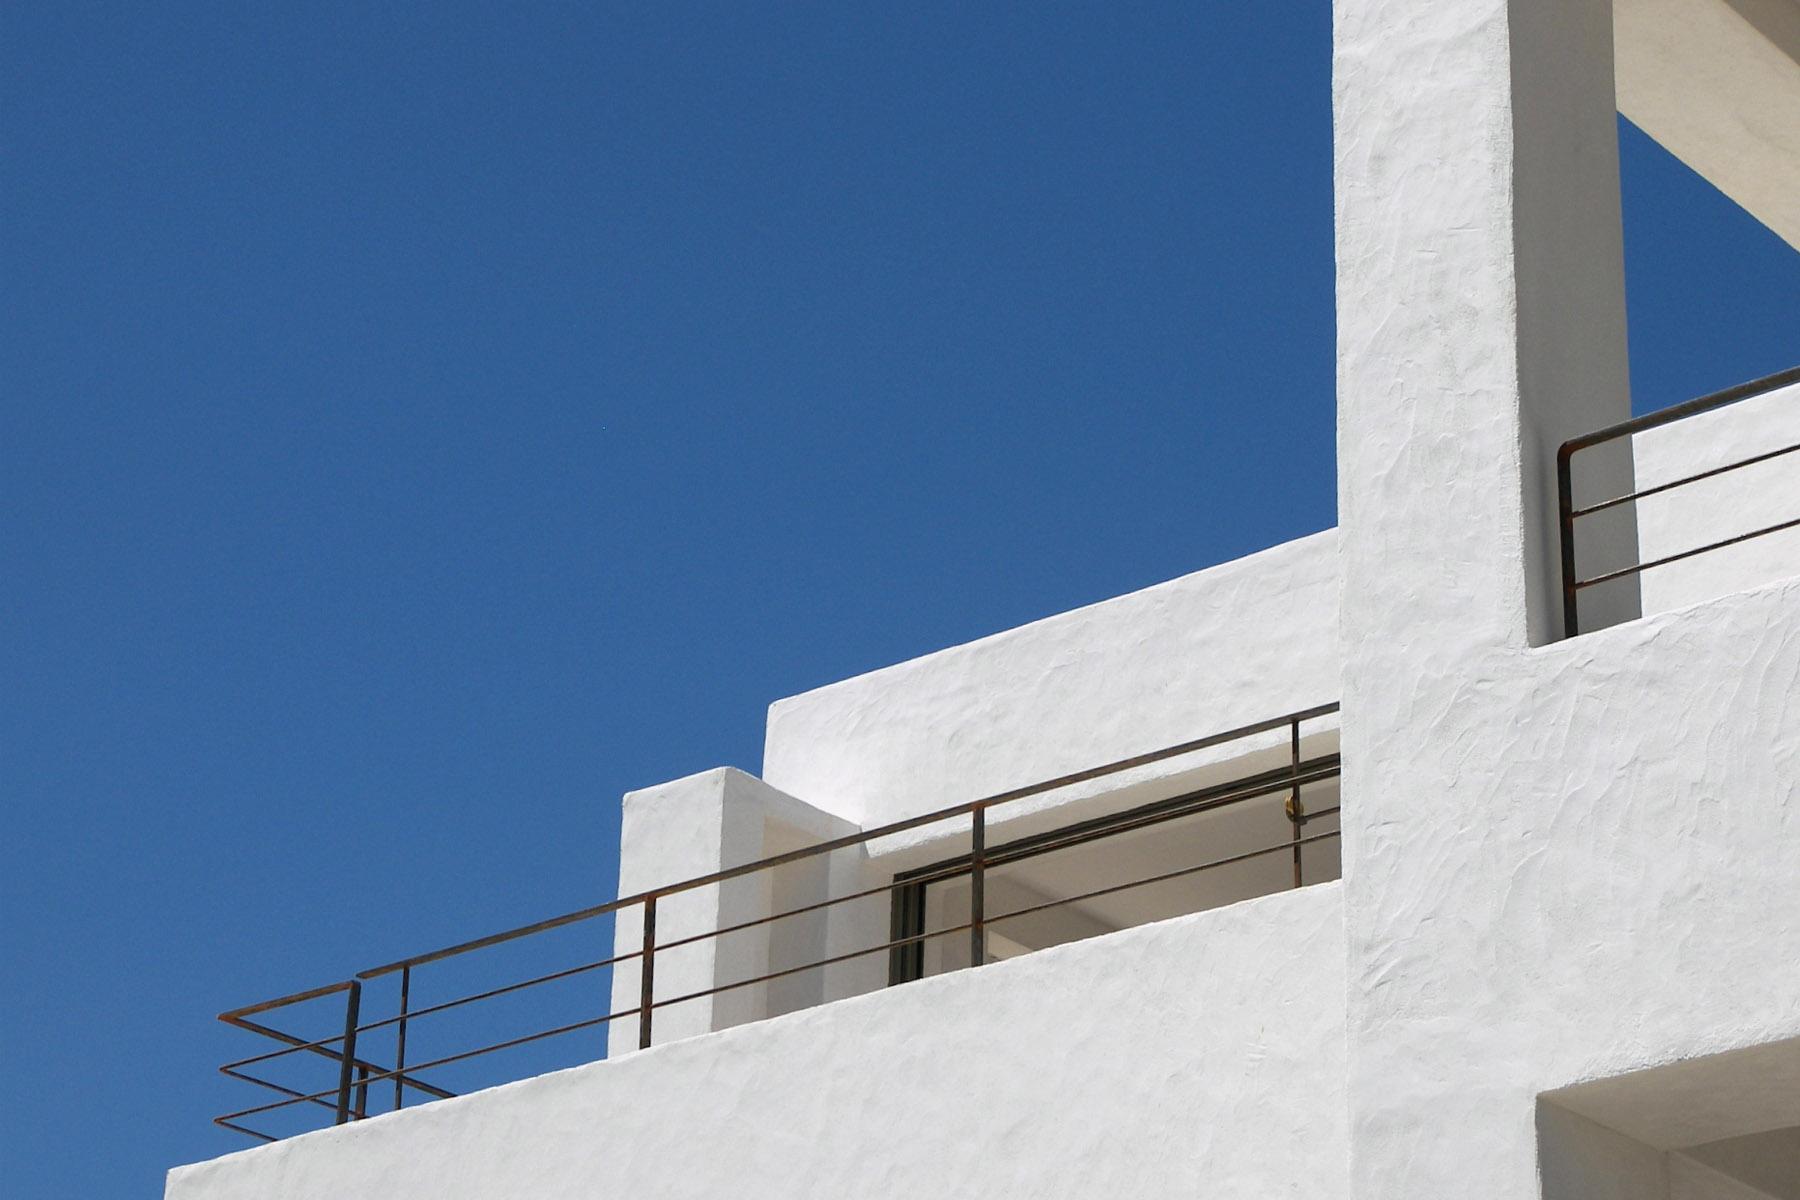 Florence_Watine_Architecte_Designer_Decoratrice_Paris_France_MaisonHR1